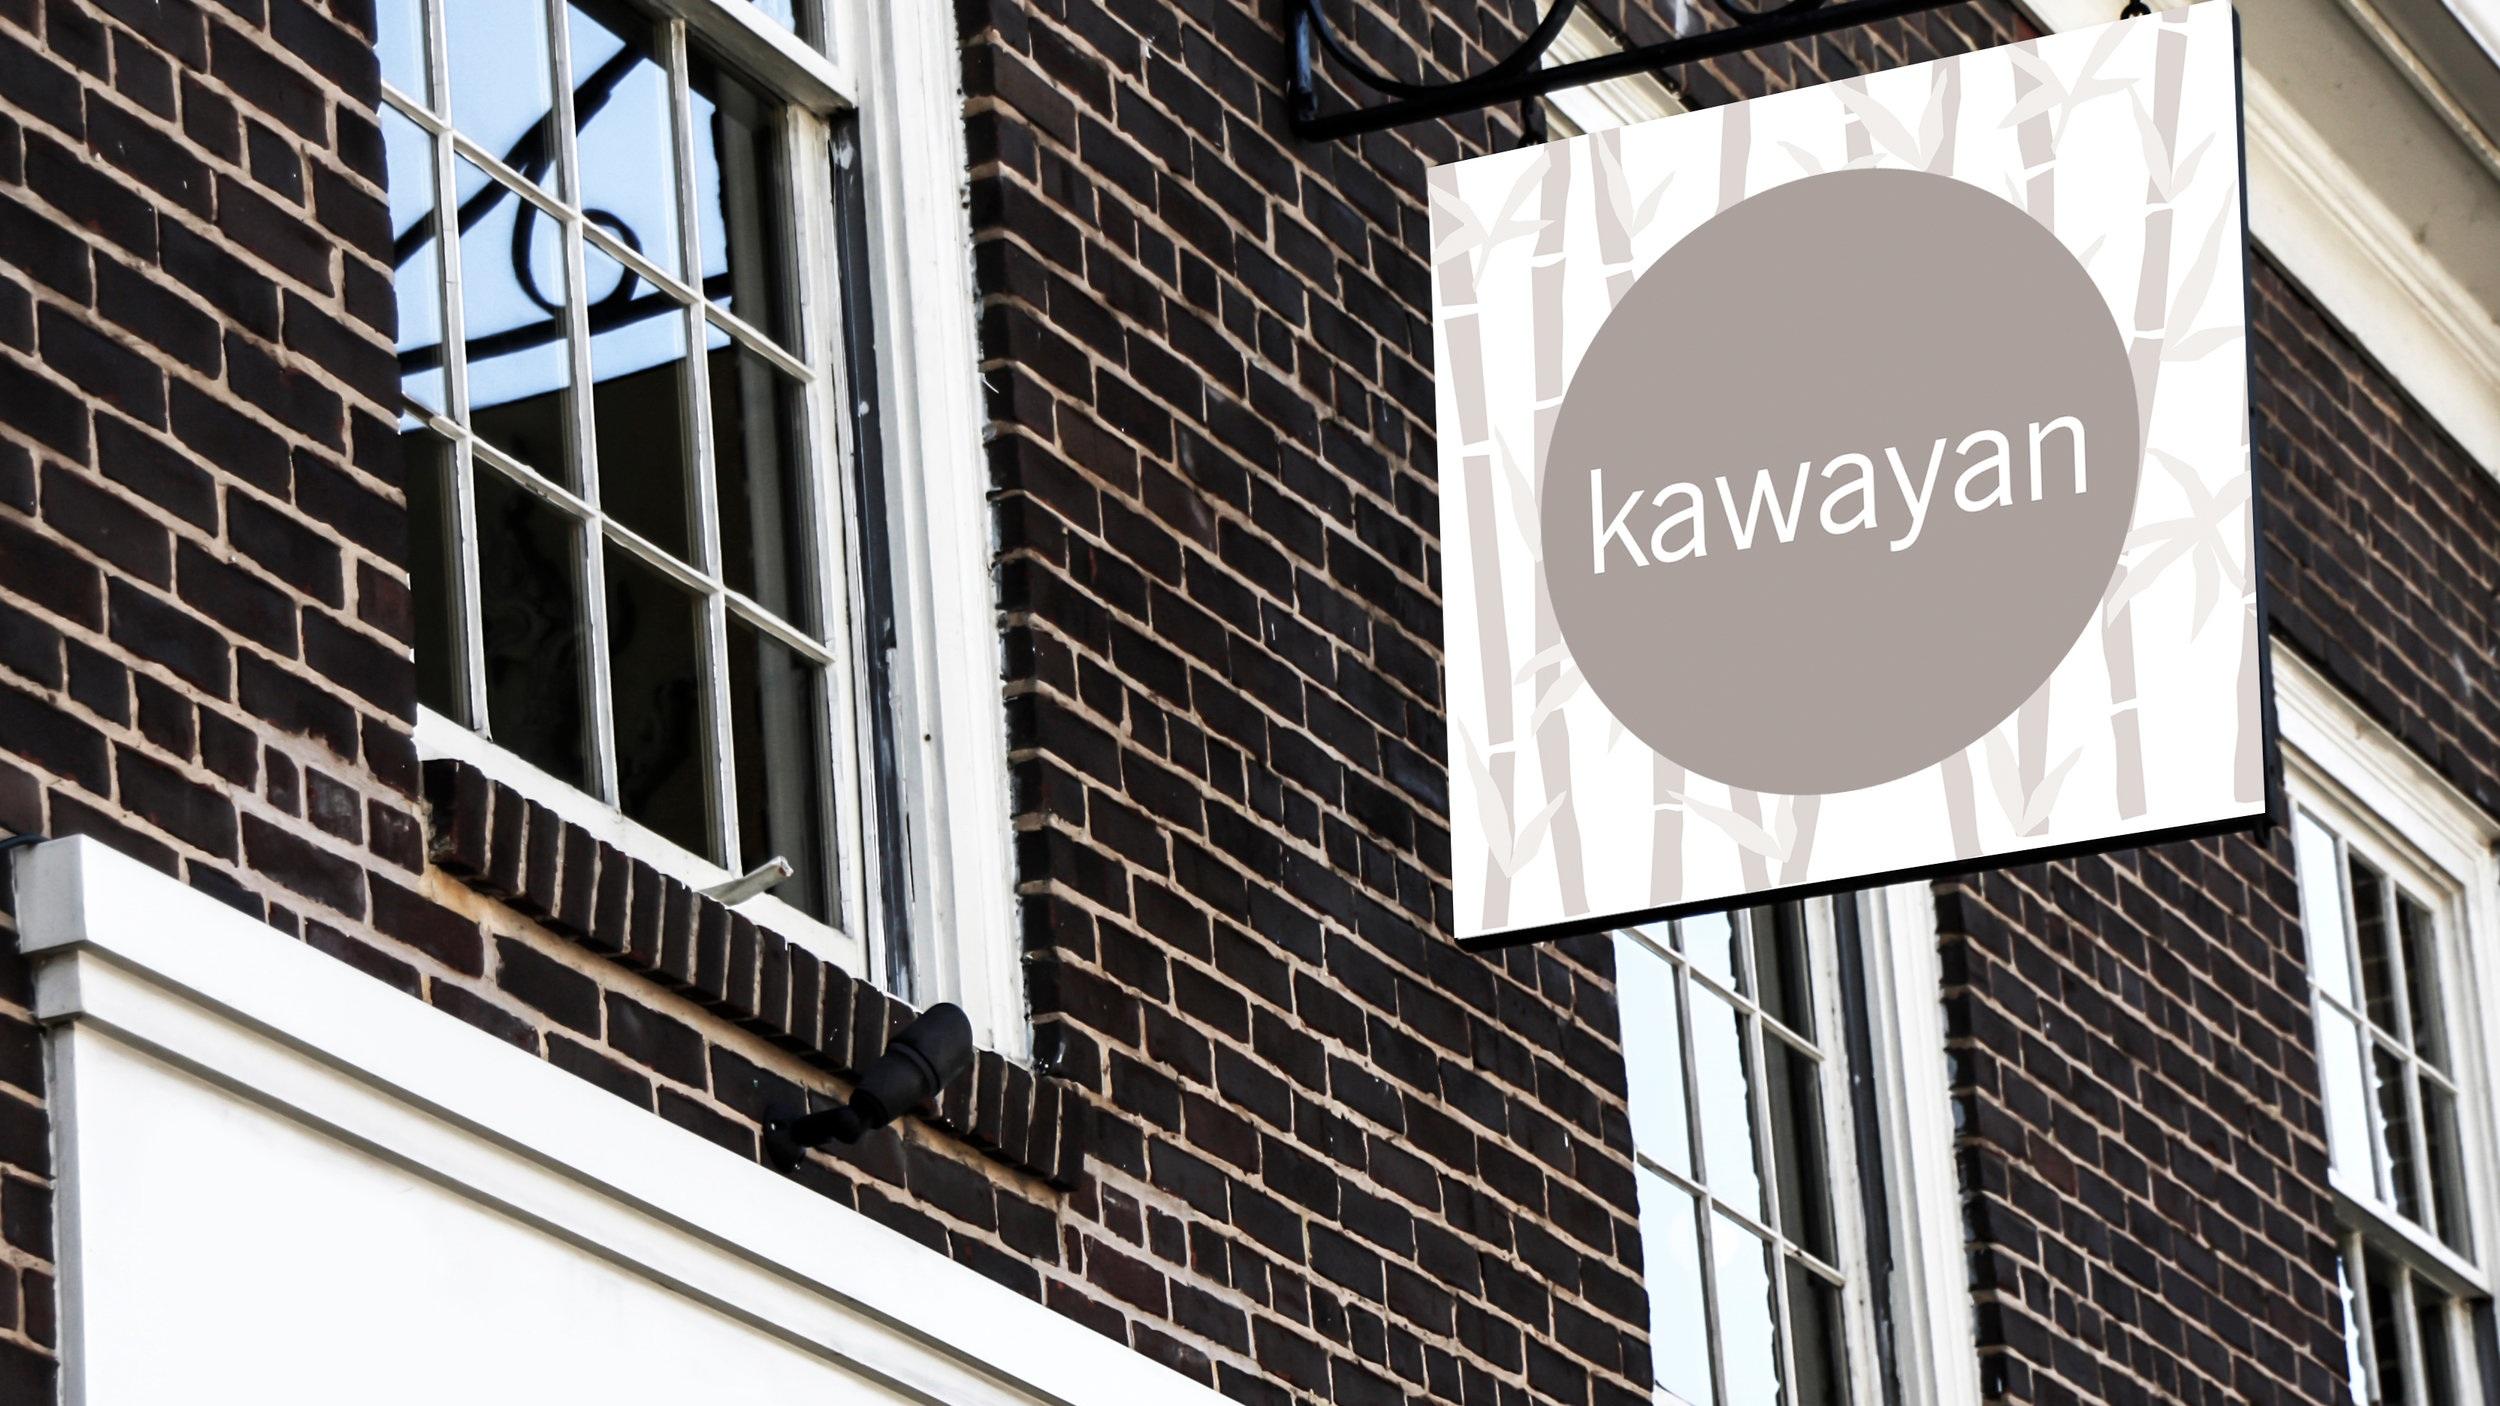 Kawayan Storefront Signage